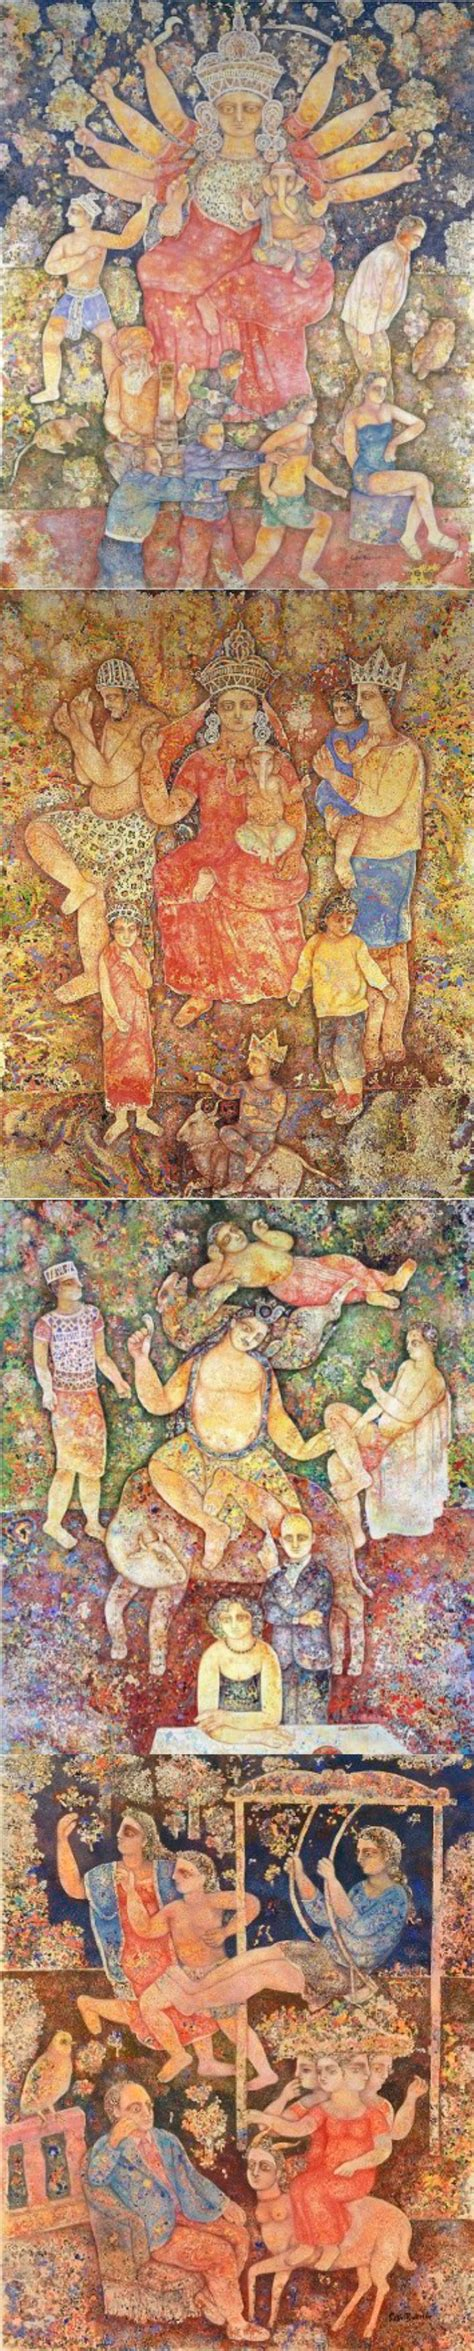 Sakti Burman - Artist Biography, Paintings, Artworks ...